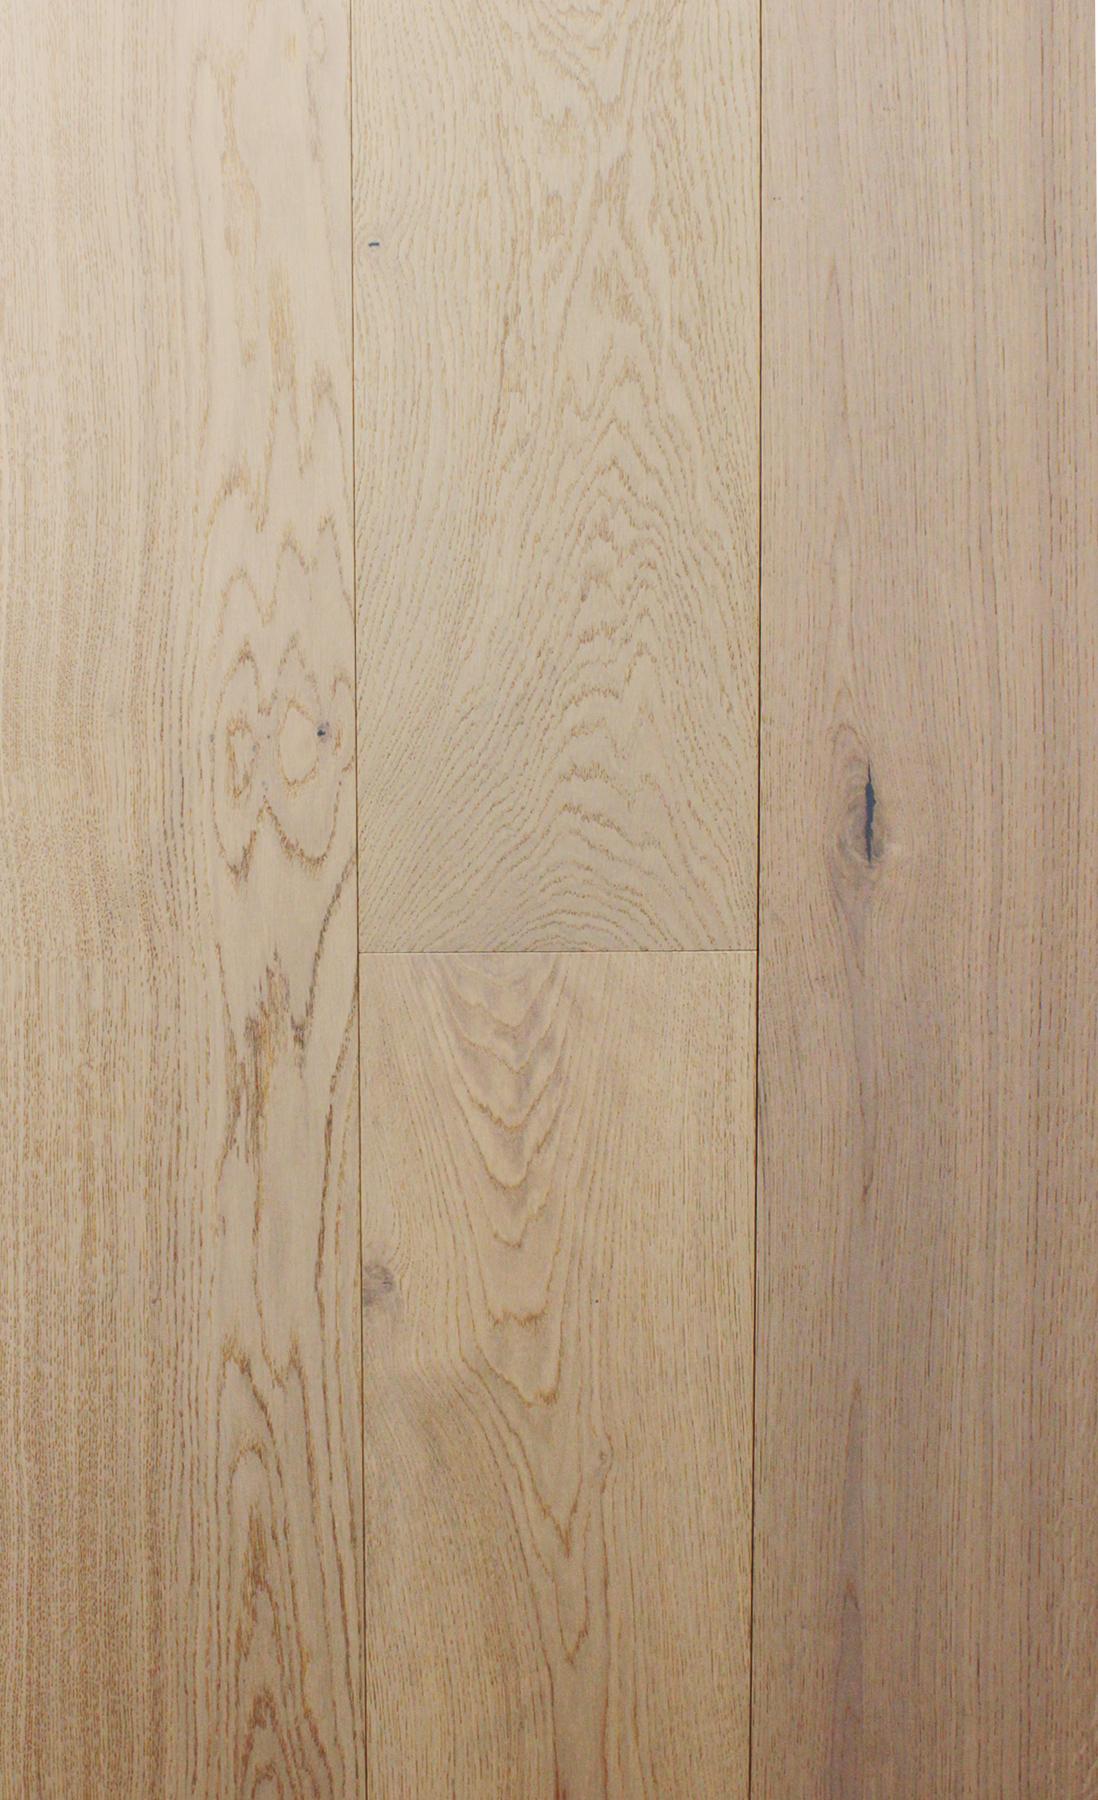 Chanel Engineered hardwood flooring vancouver